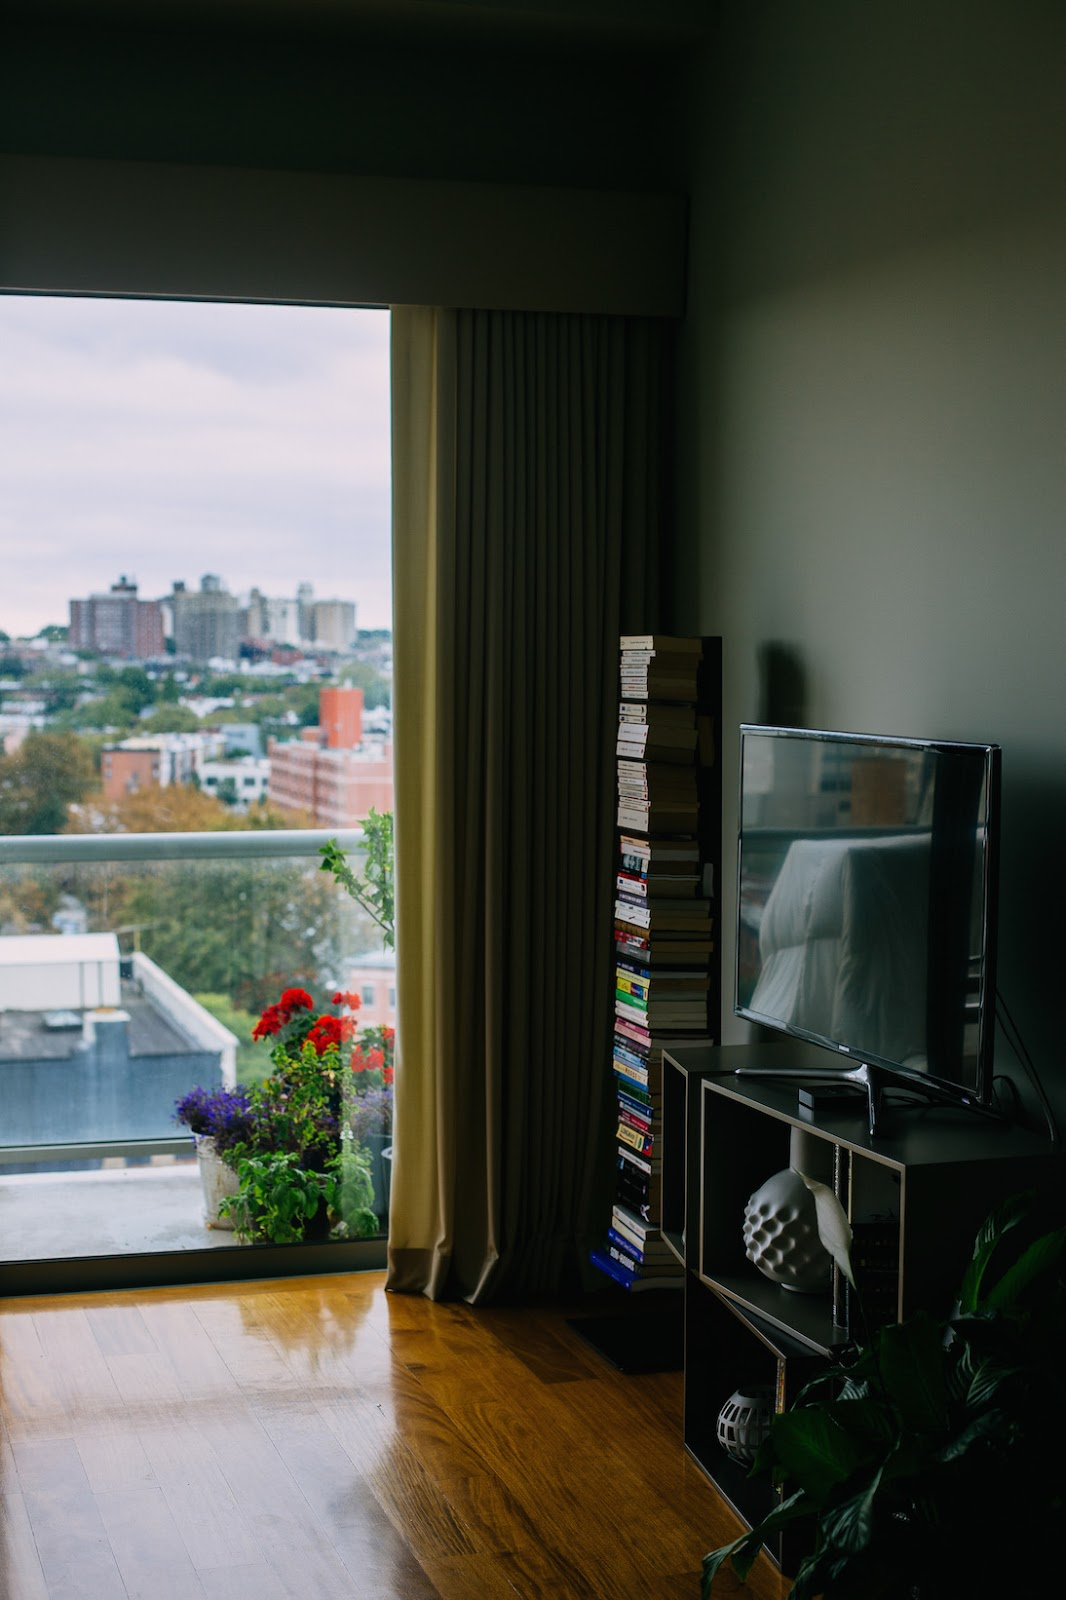 airbnb-brooklyn-fort-greene-new-york-city-11.jpg